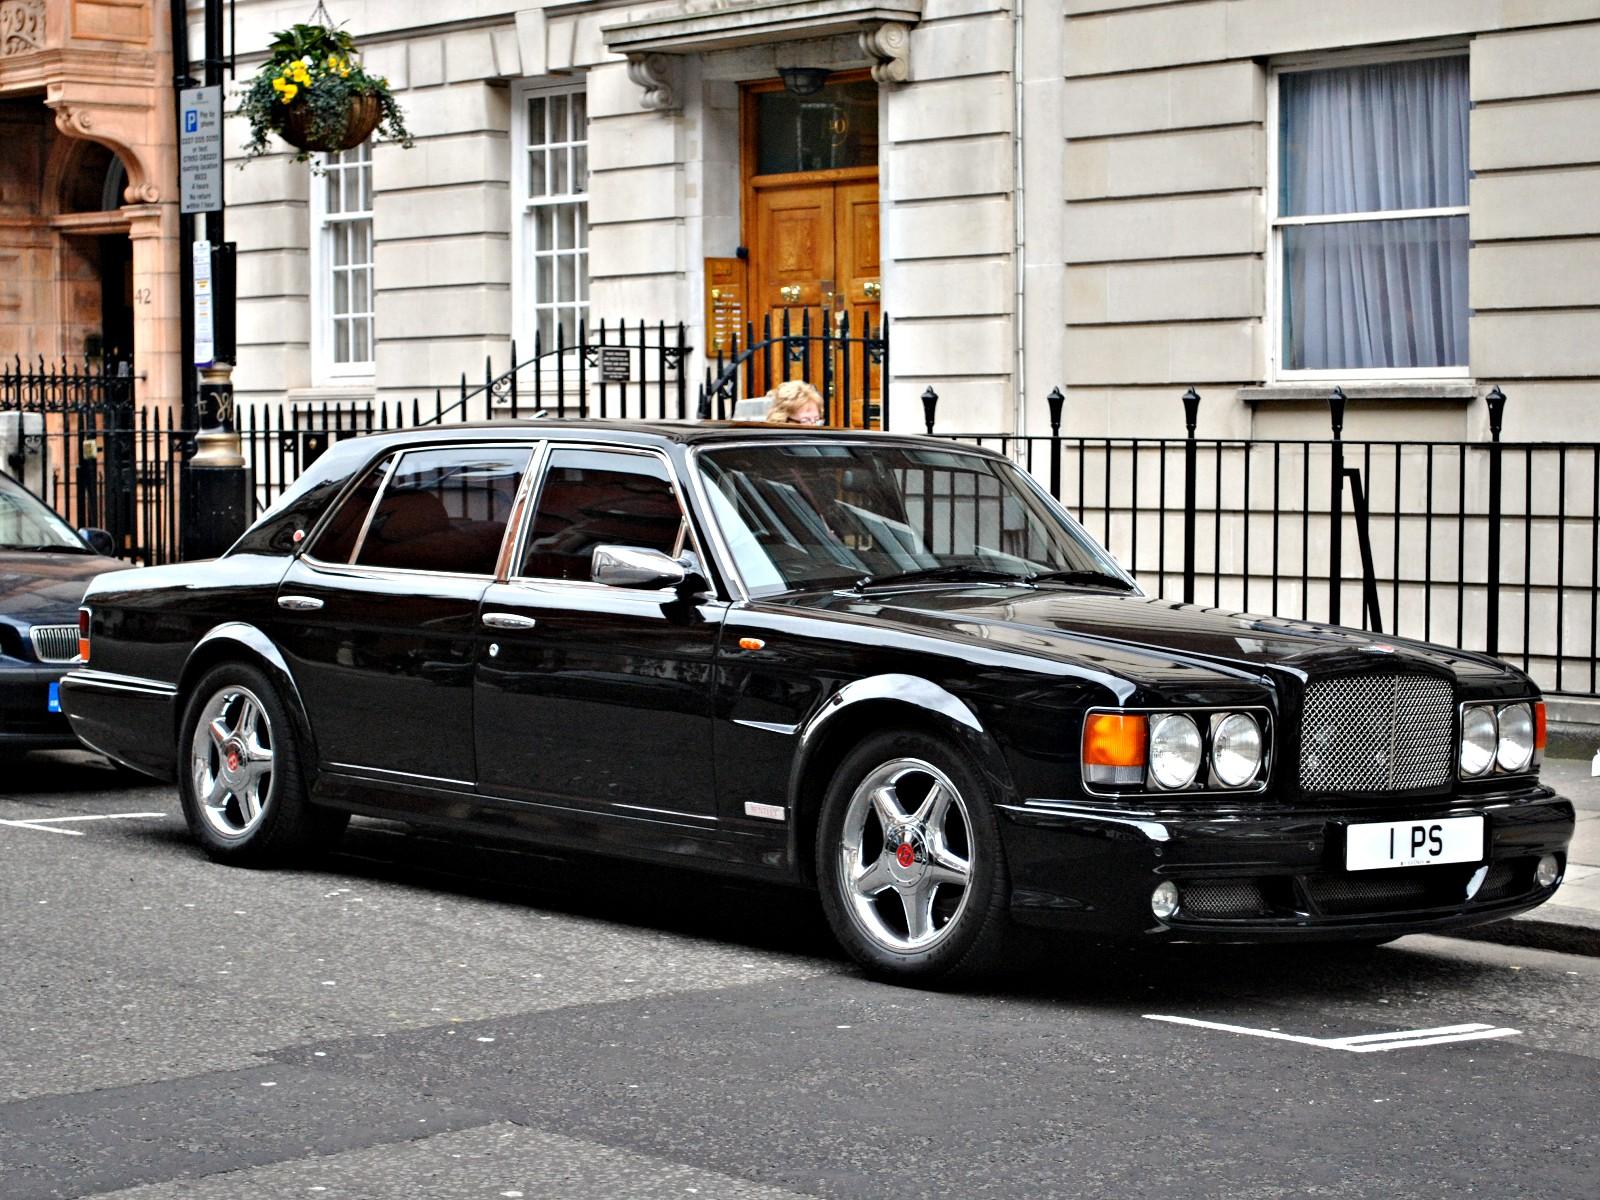 File:Bentley Turbo RT.jpg - Wikipedia, the free encyclopedia